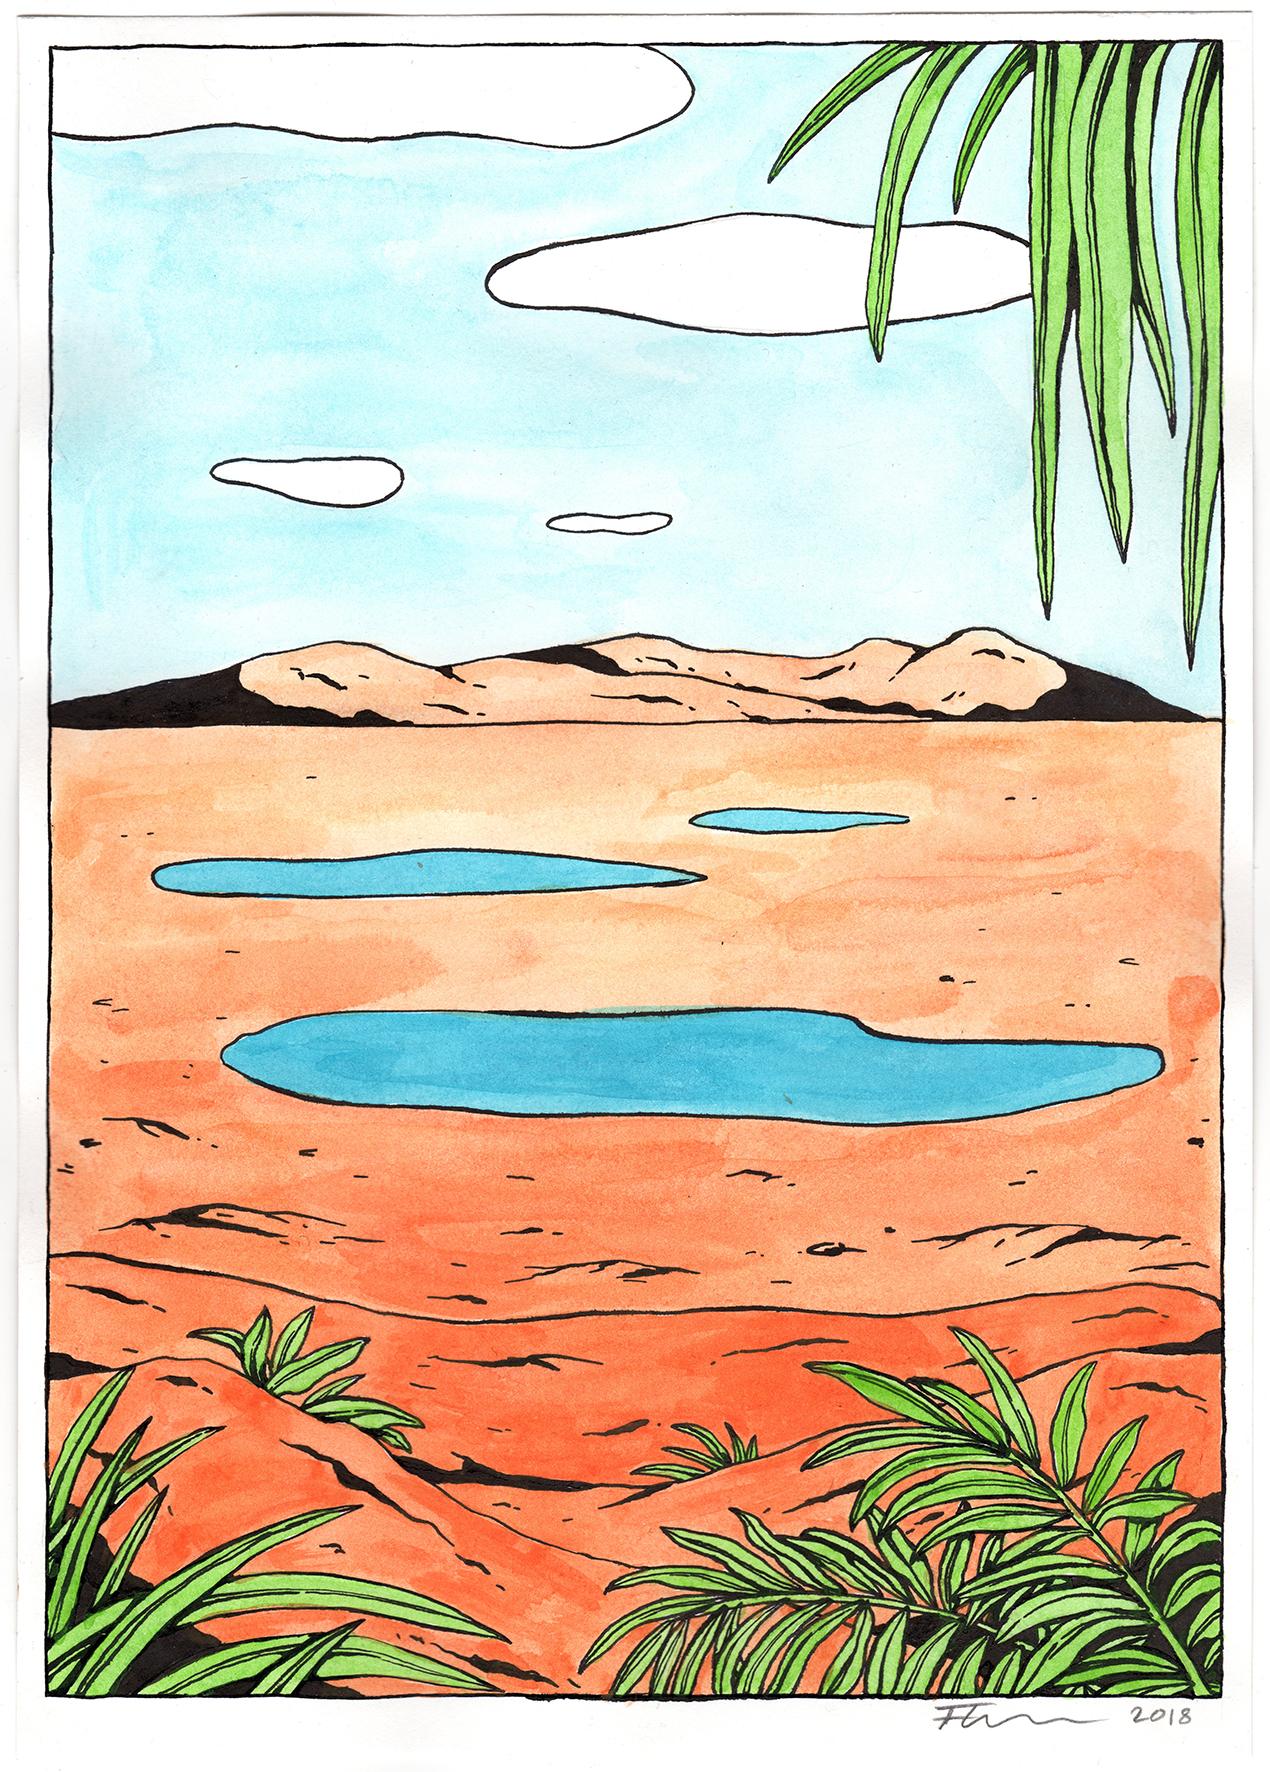 9. Floor van het Nederend, Lakes and Clouds, 2018, 29,7 x 21 cm, acrylics and ink on paper €500,-.jpg